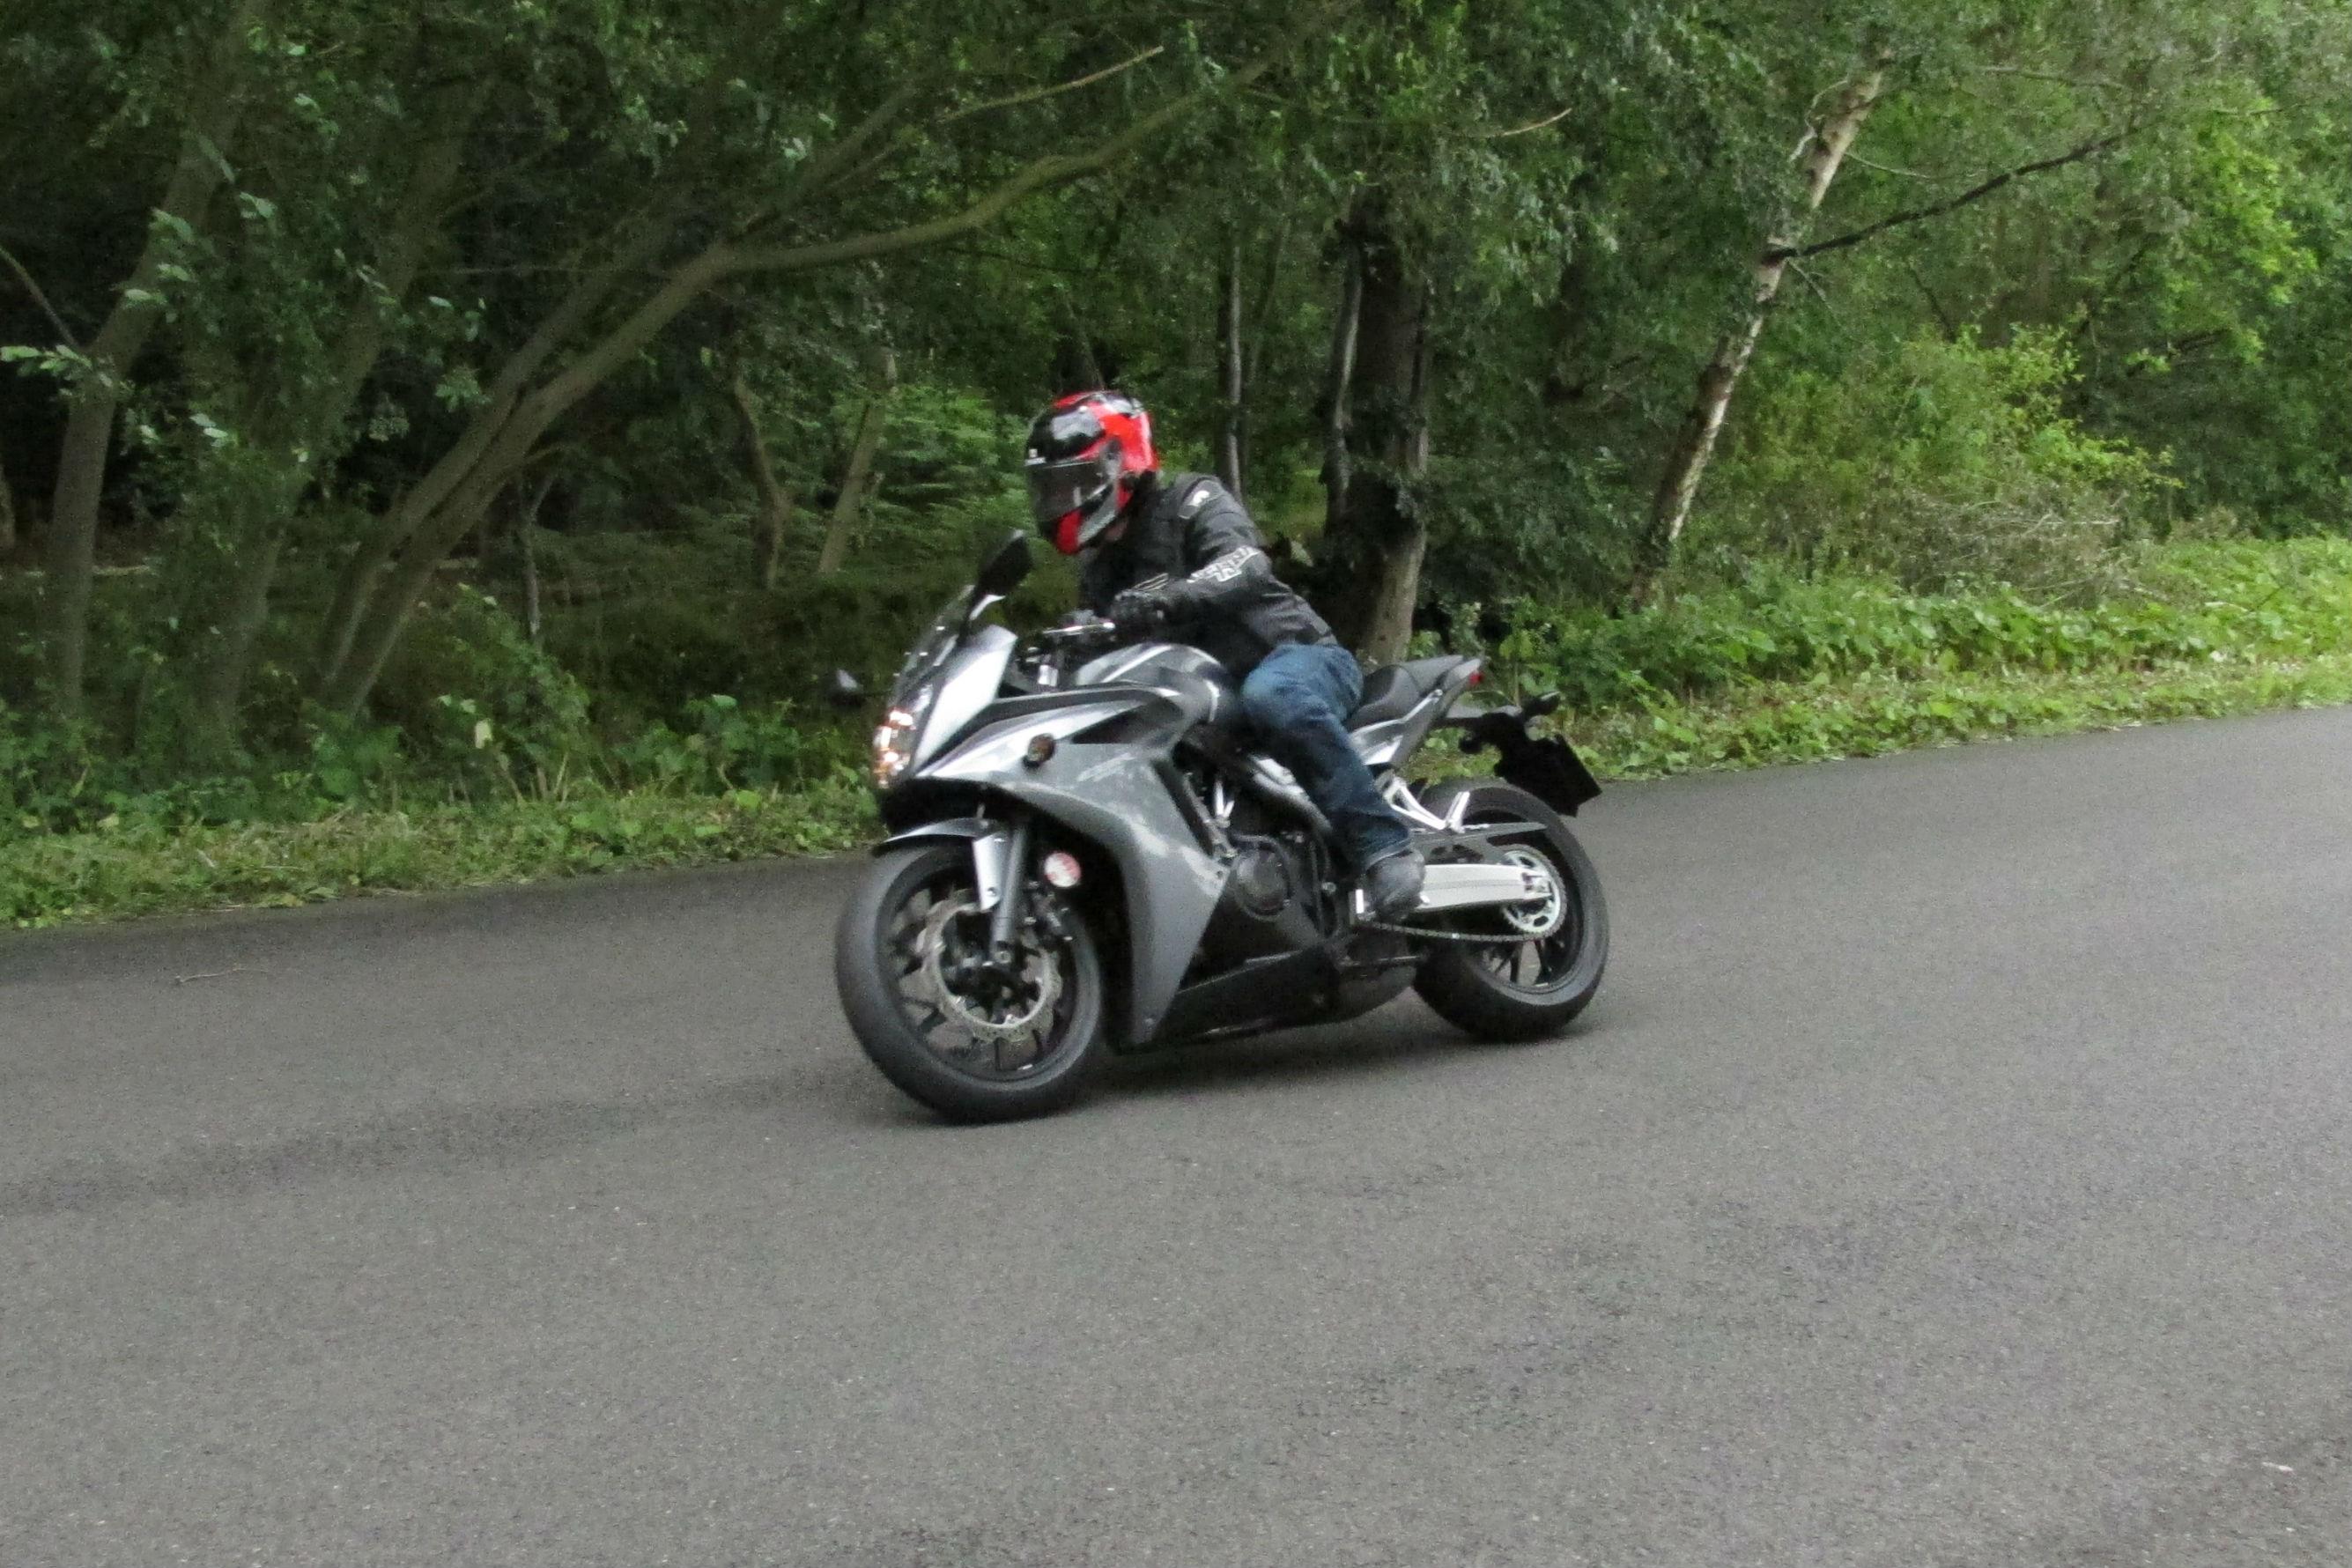 Honda cbr650f review uk dating 8